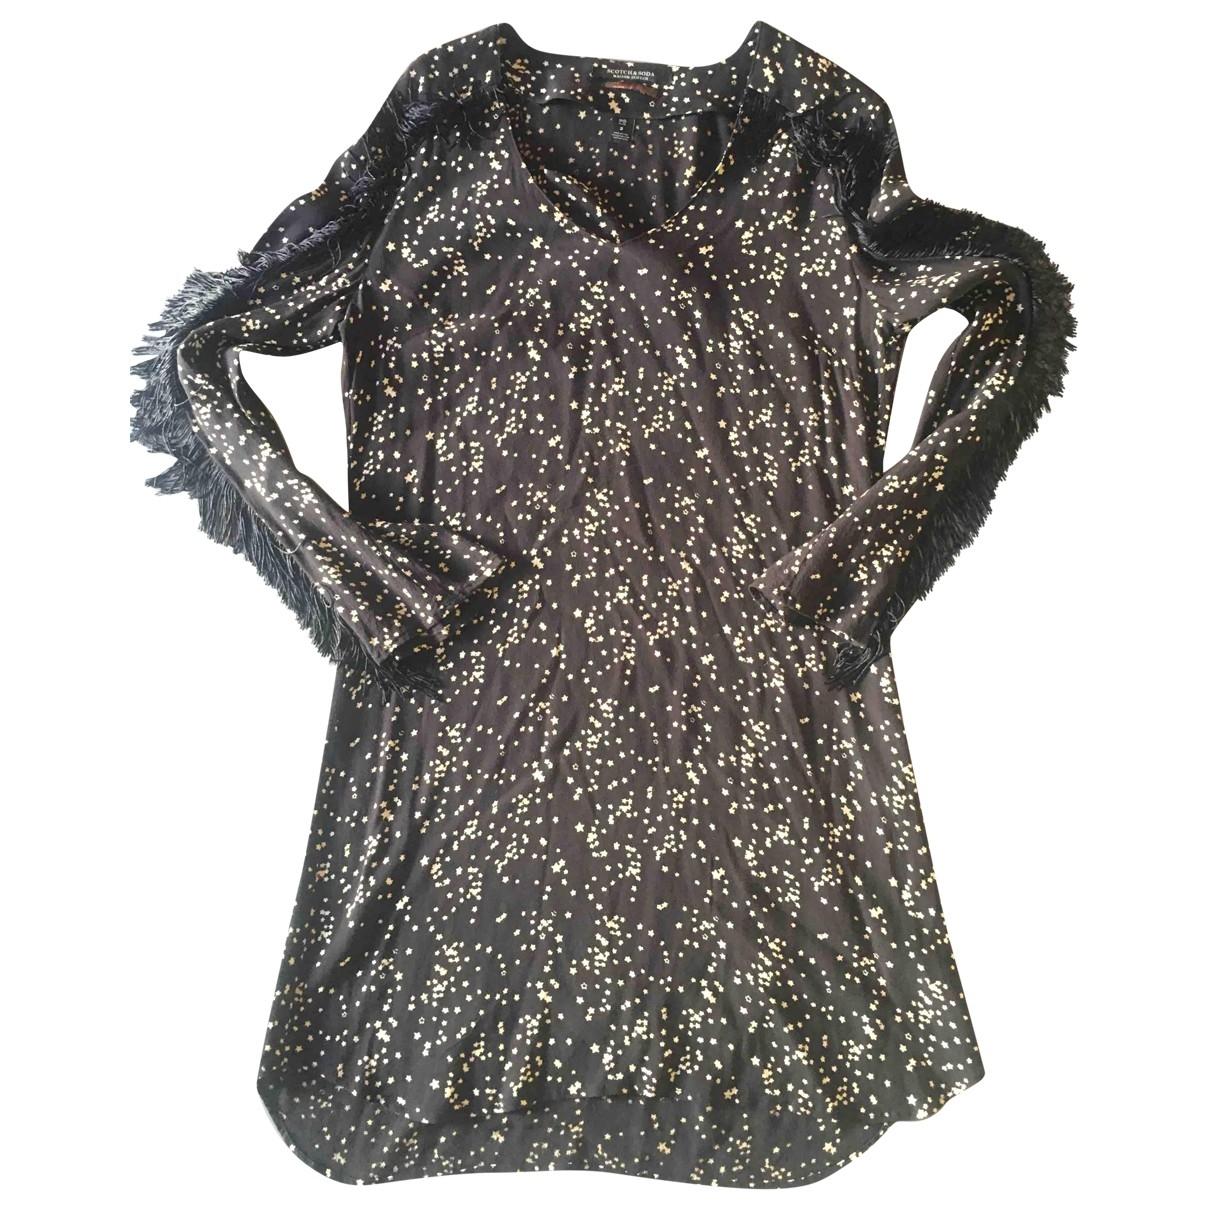 Scotch & Soda \N Kleid in  Schwarz Baumwolle